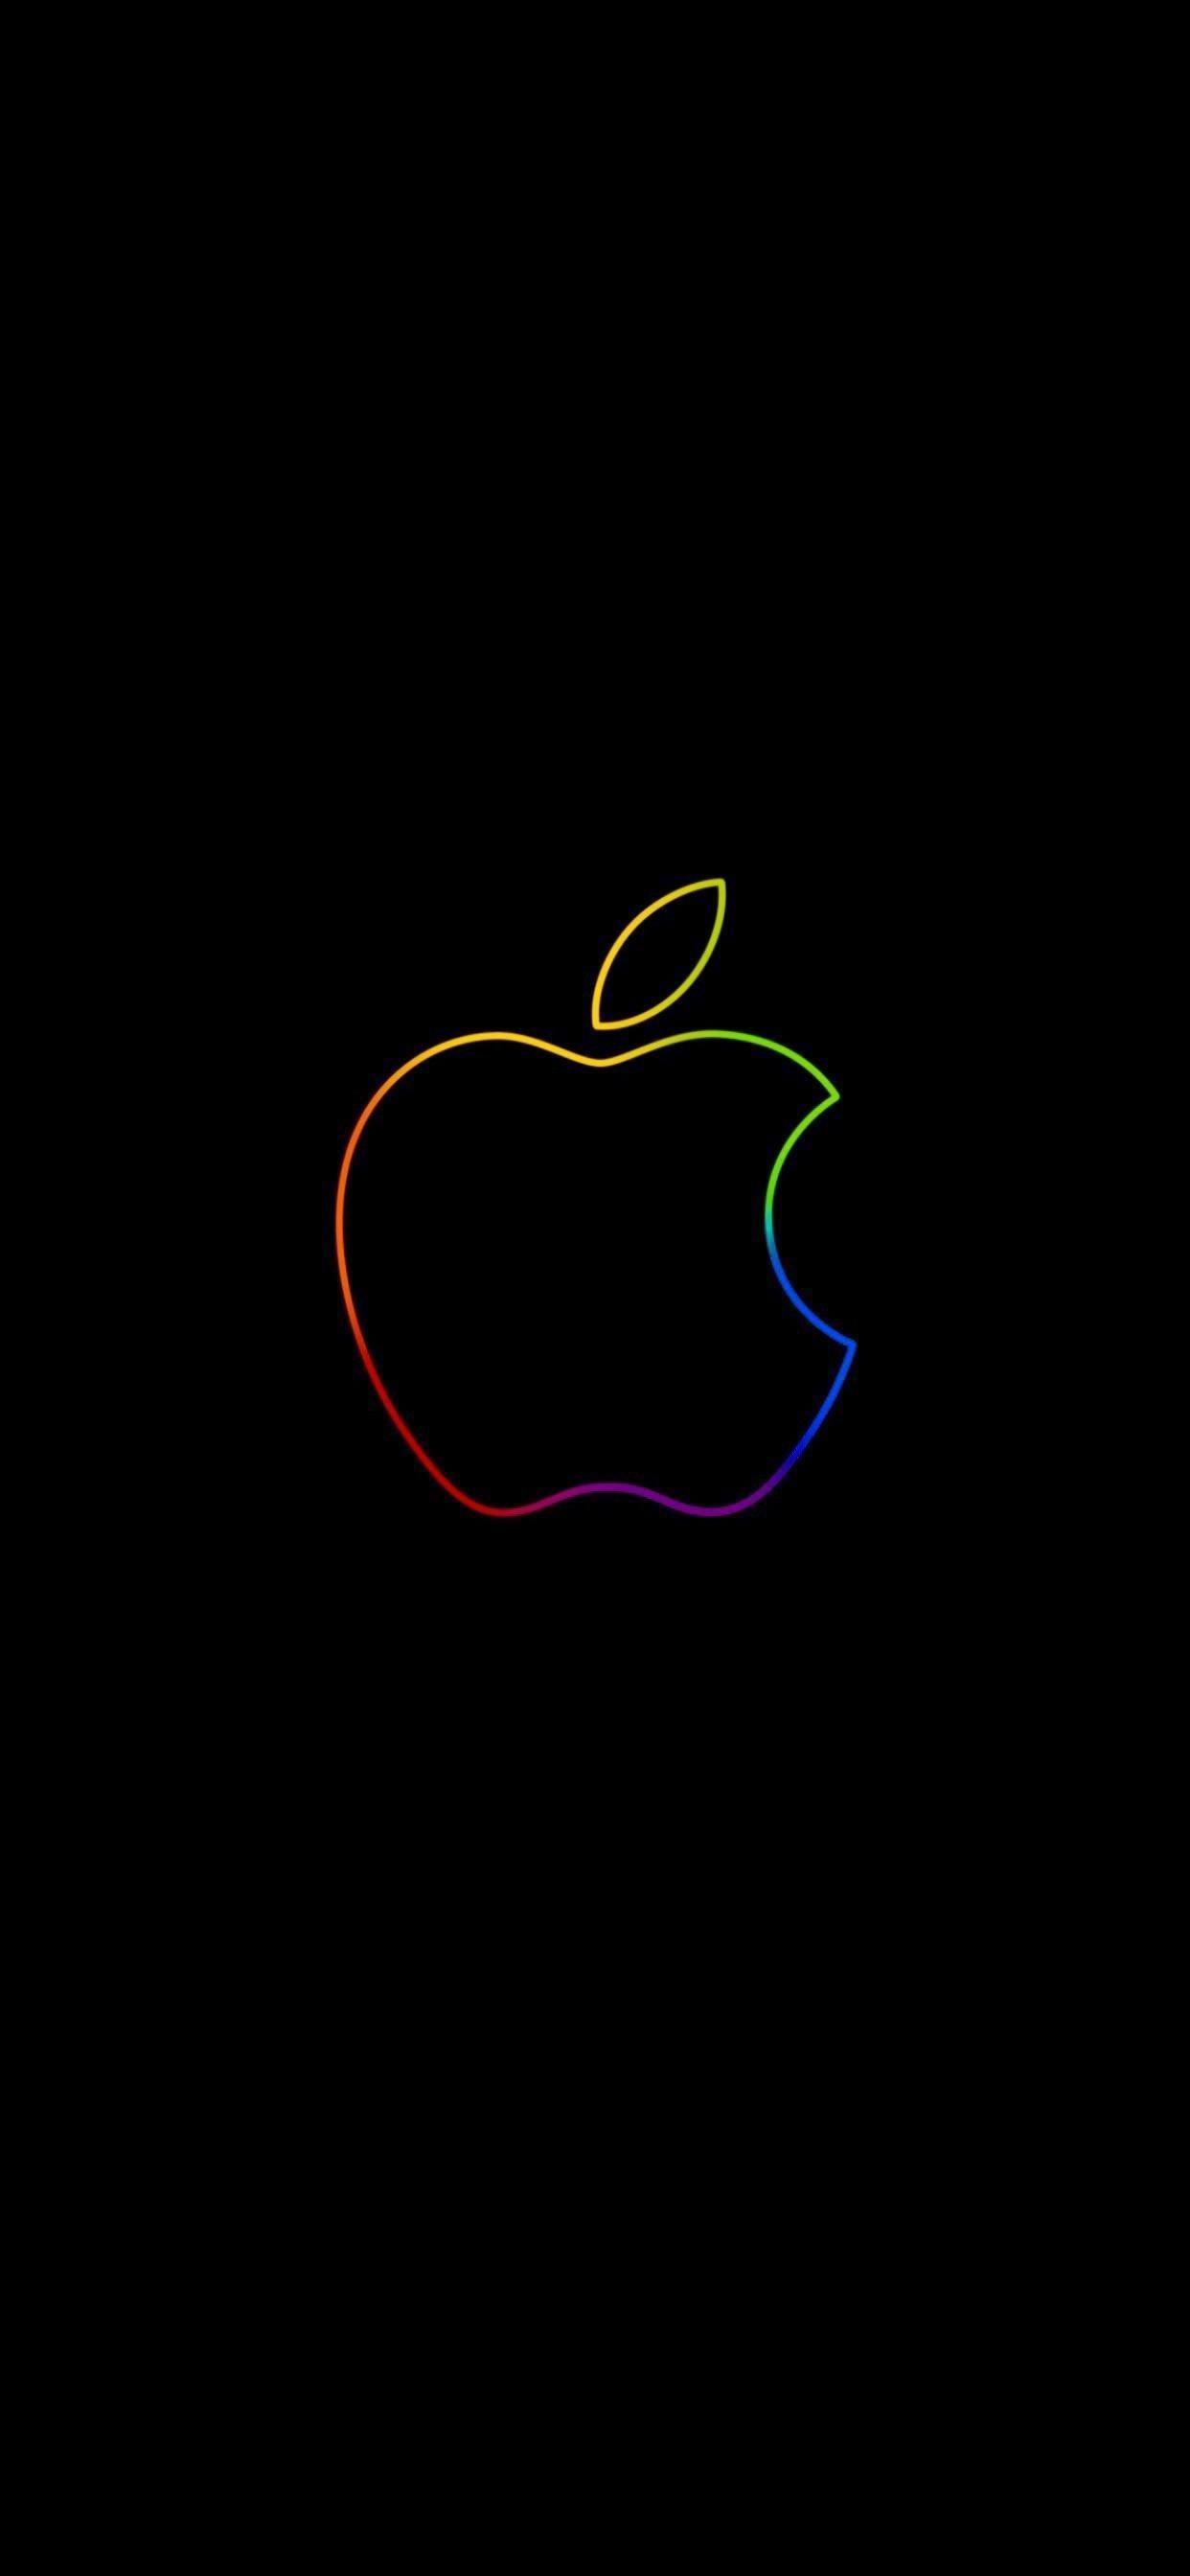 Apple Logo Neon Applewallpaperiphone Apple Logo Neon Iphone Wallpaper Logo Apple Logo Wallpaper Iphone Apple Wallpaper Iphone